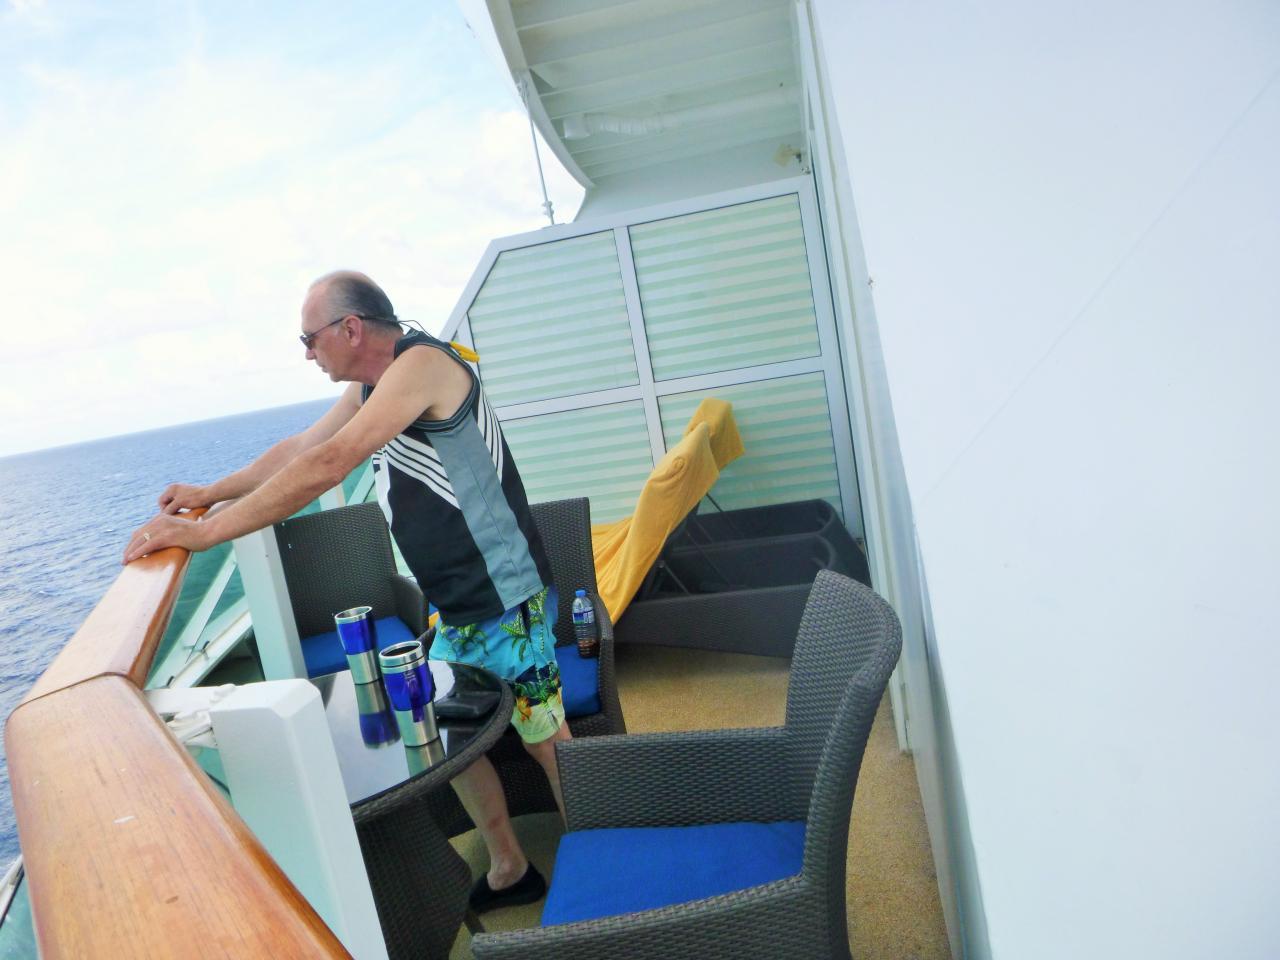 Royal Caribbean Jewel of the Seas 1600